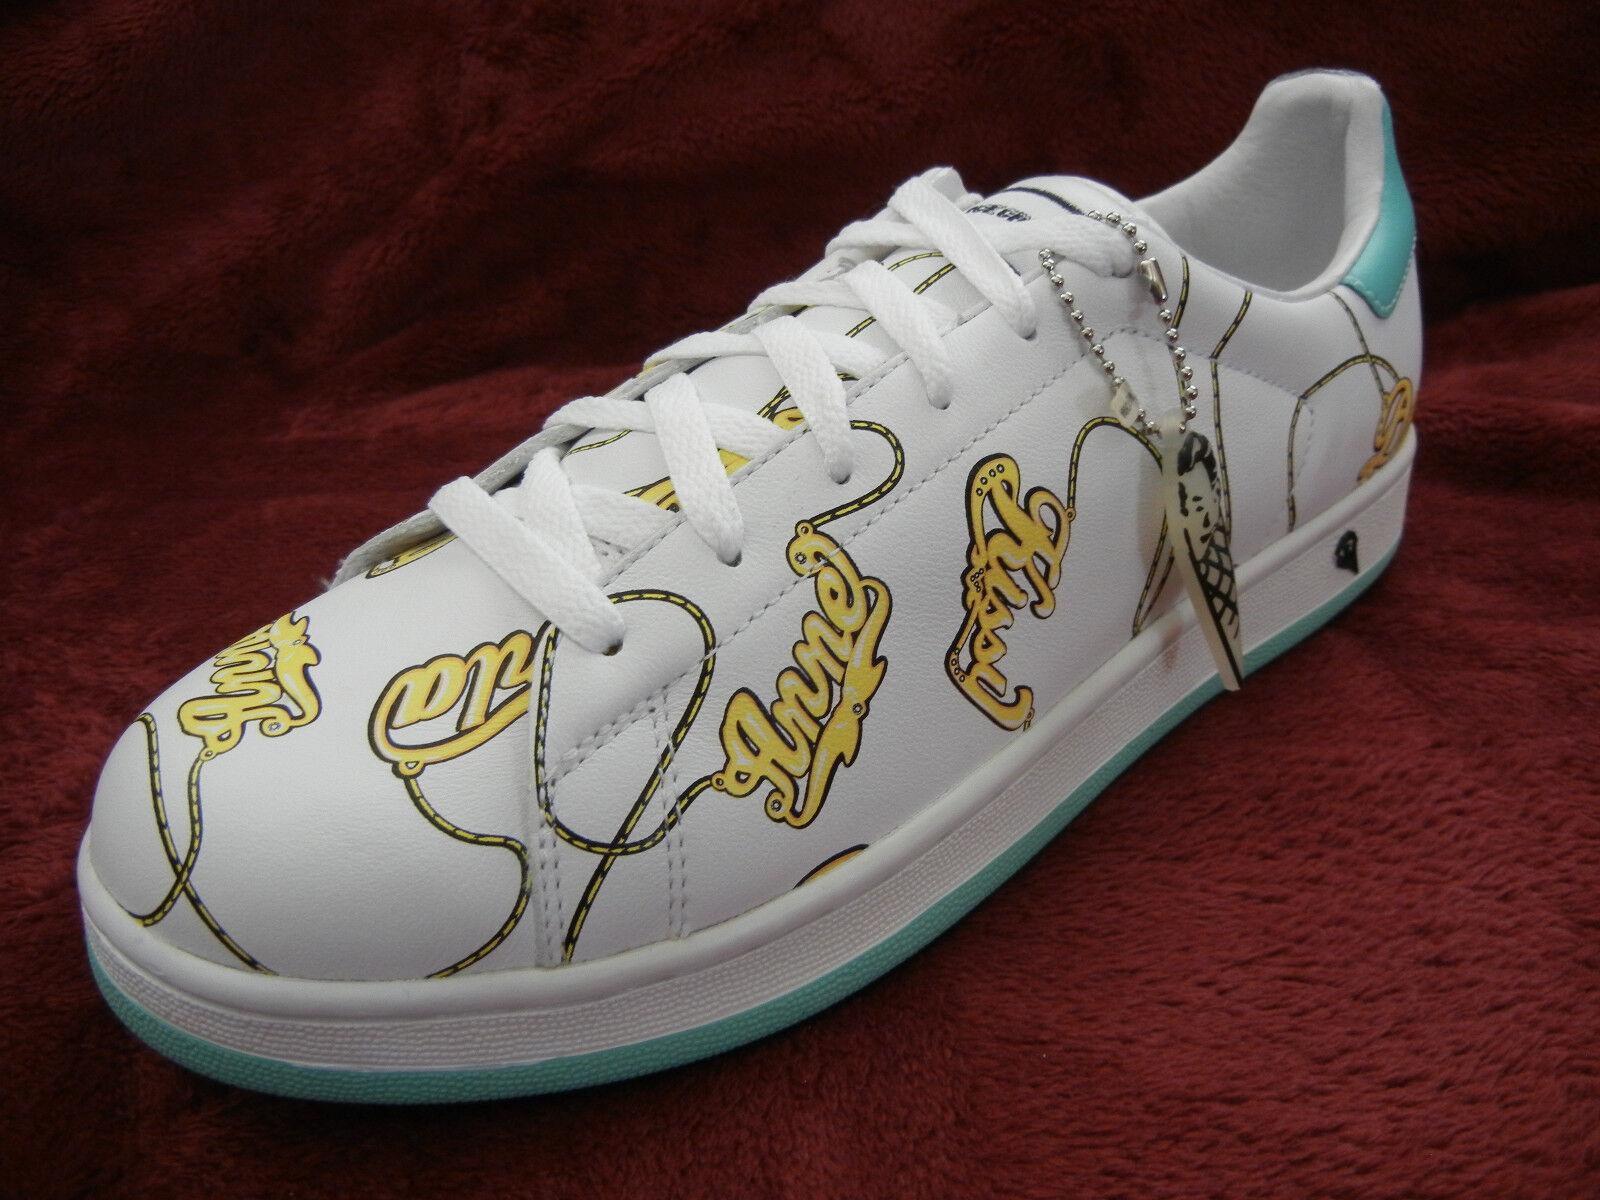 Reebok Ice Cream no.1010 テンテン #BOUTIQUES white Sneakers SIZE 10 pharrell BBC